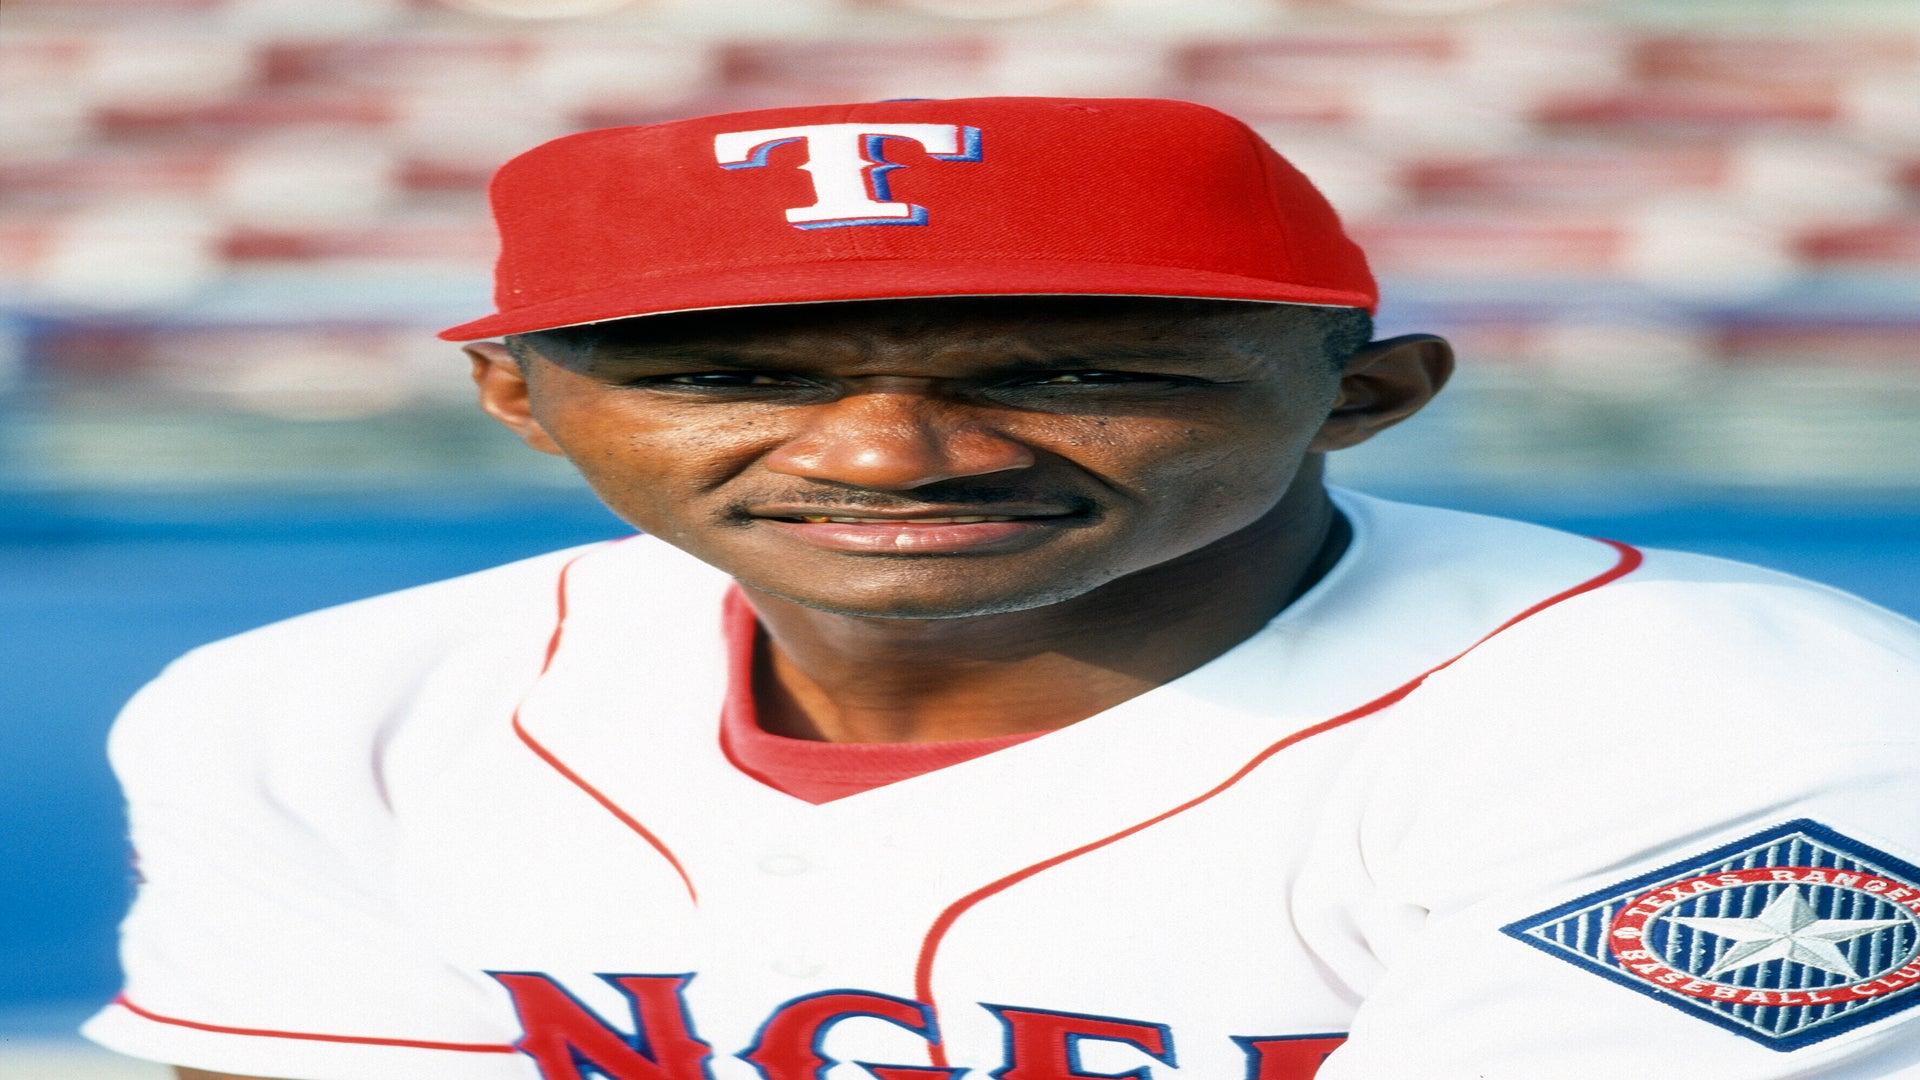 Police: Former Braves Player Otis Nixon Is Missing